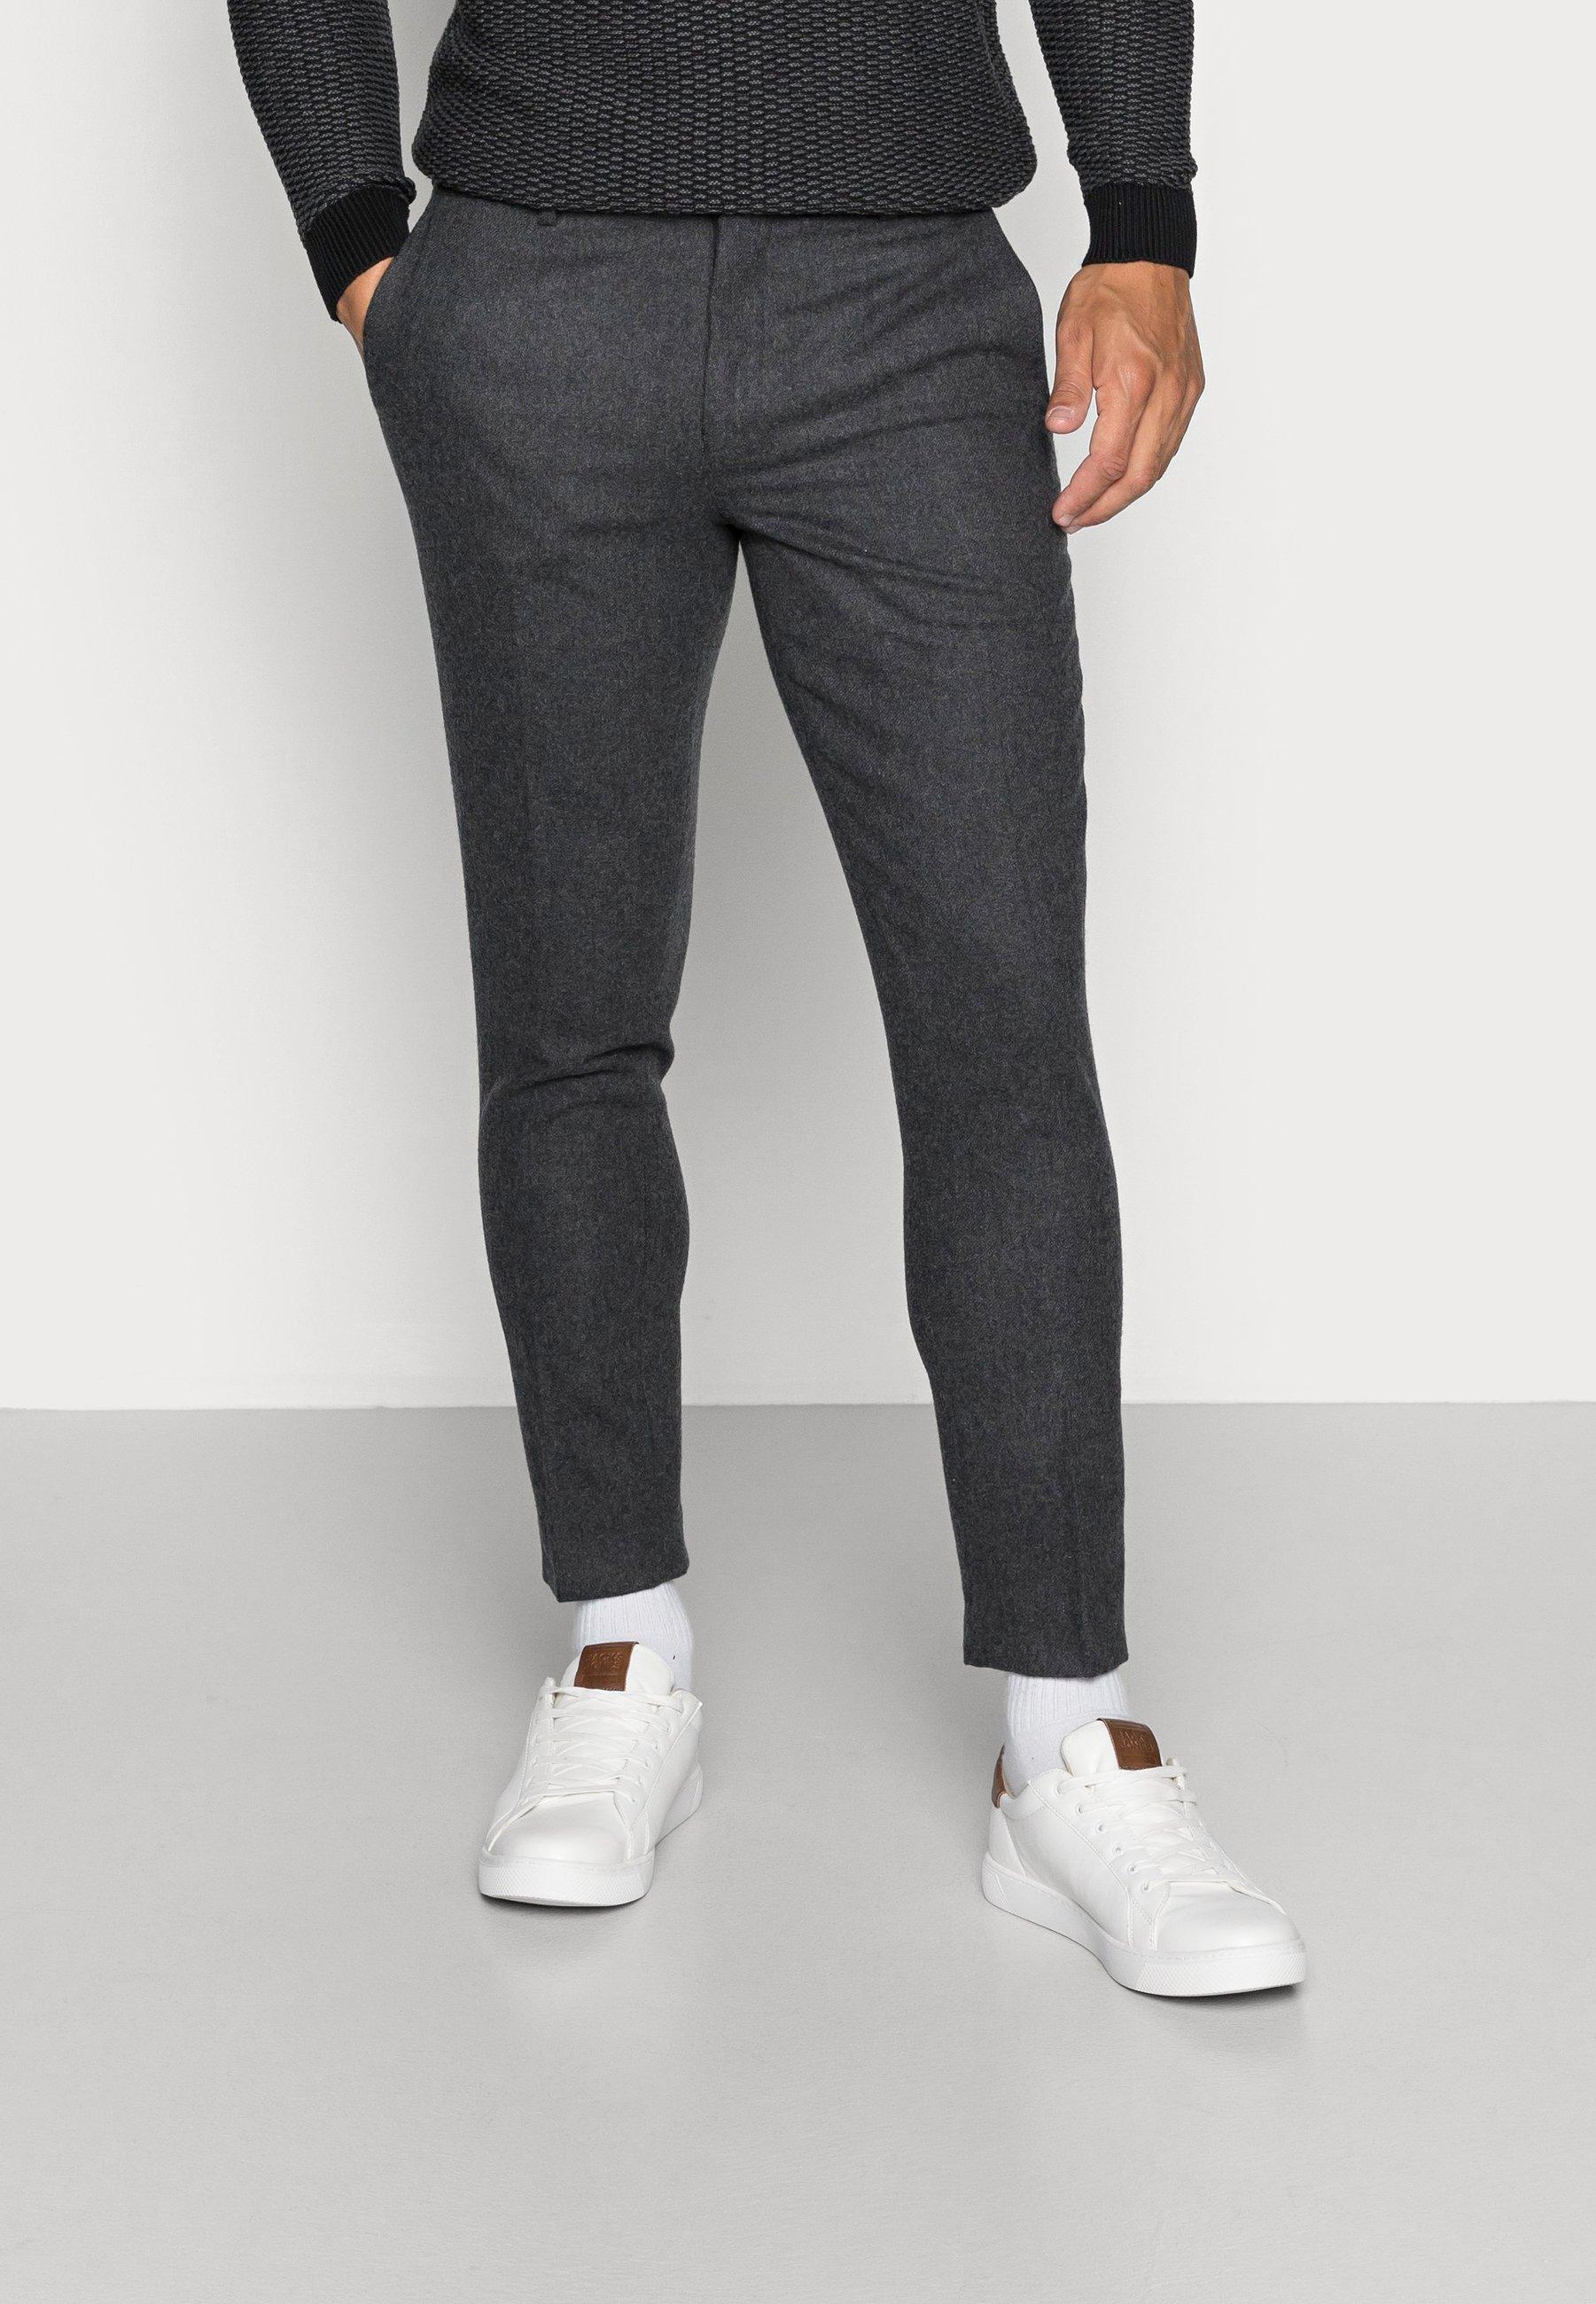 Uomo BEMBRIDGE TROUSER - Pantaloni